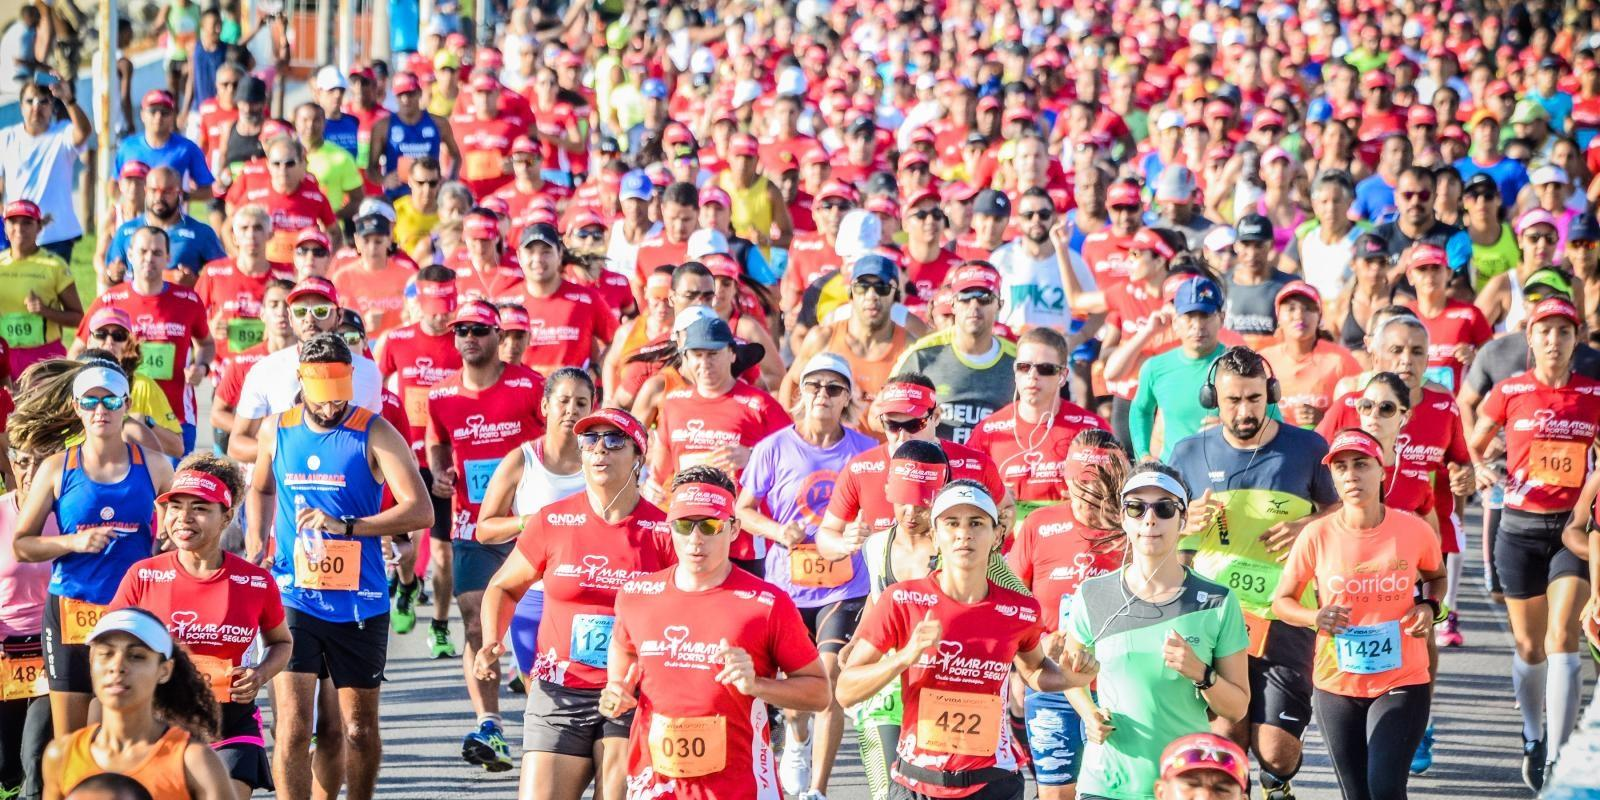 Meia Maratona do Descobrimento Porto Seguro, oferece